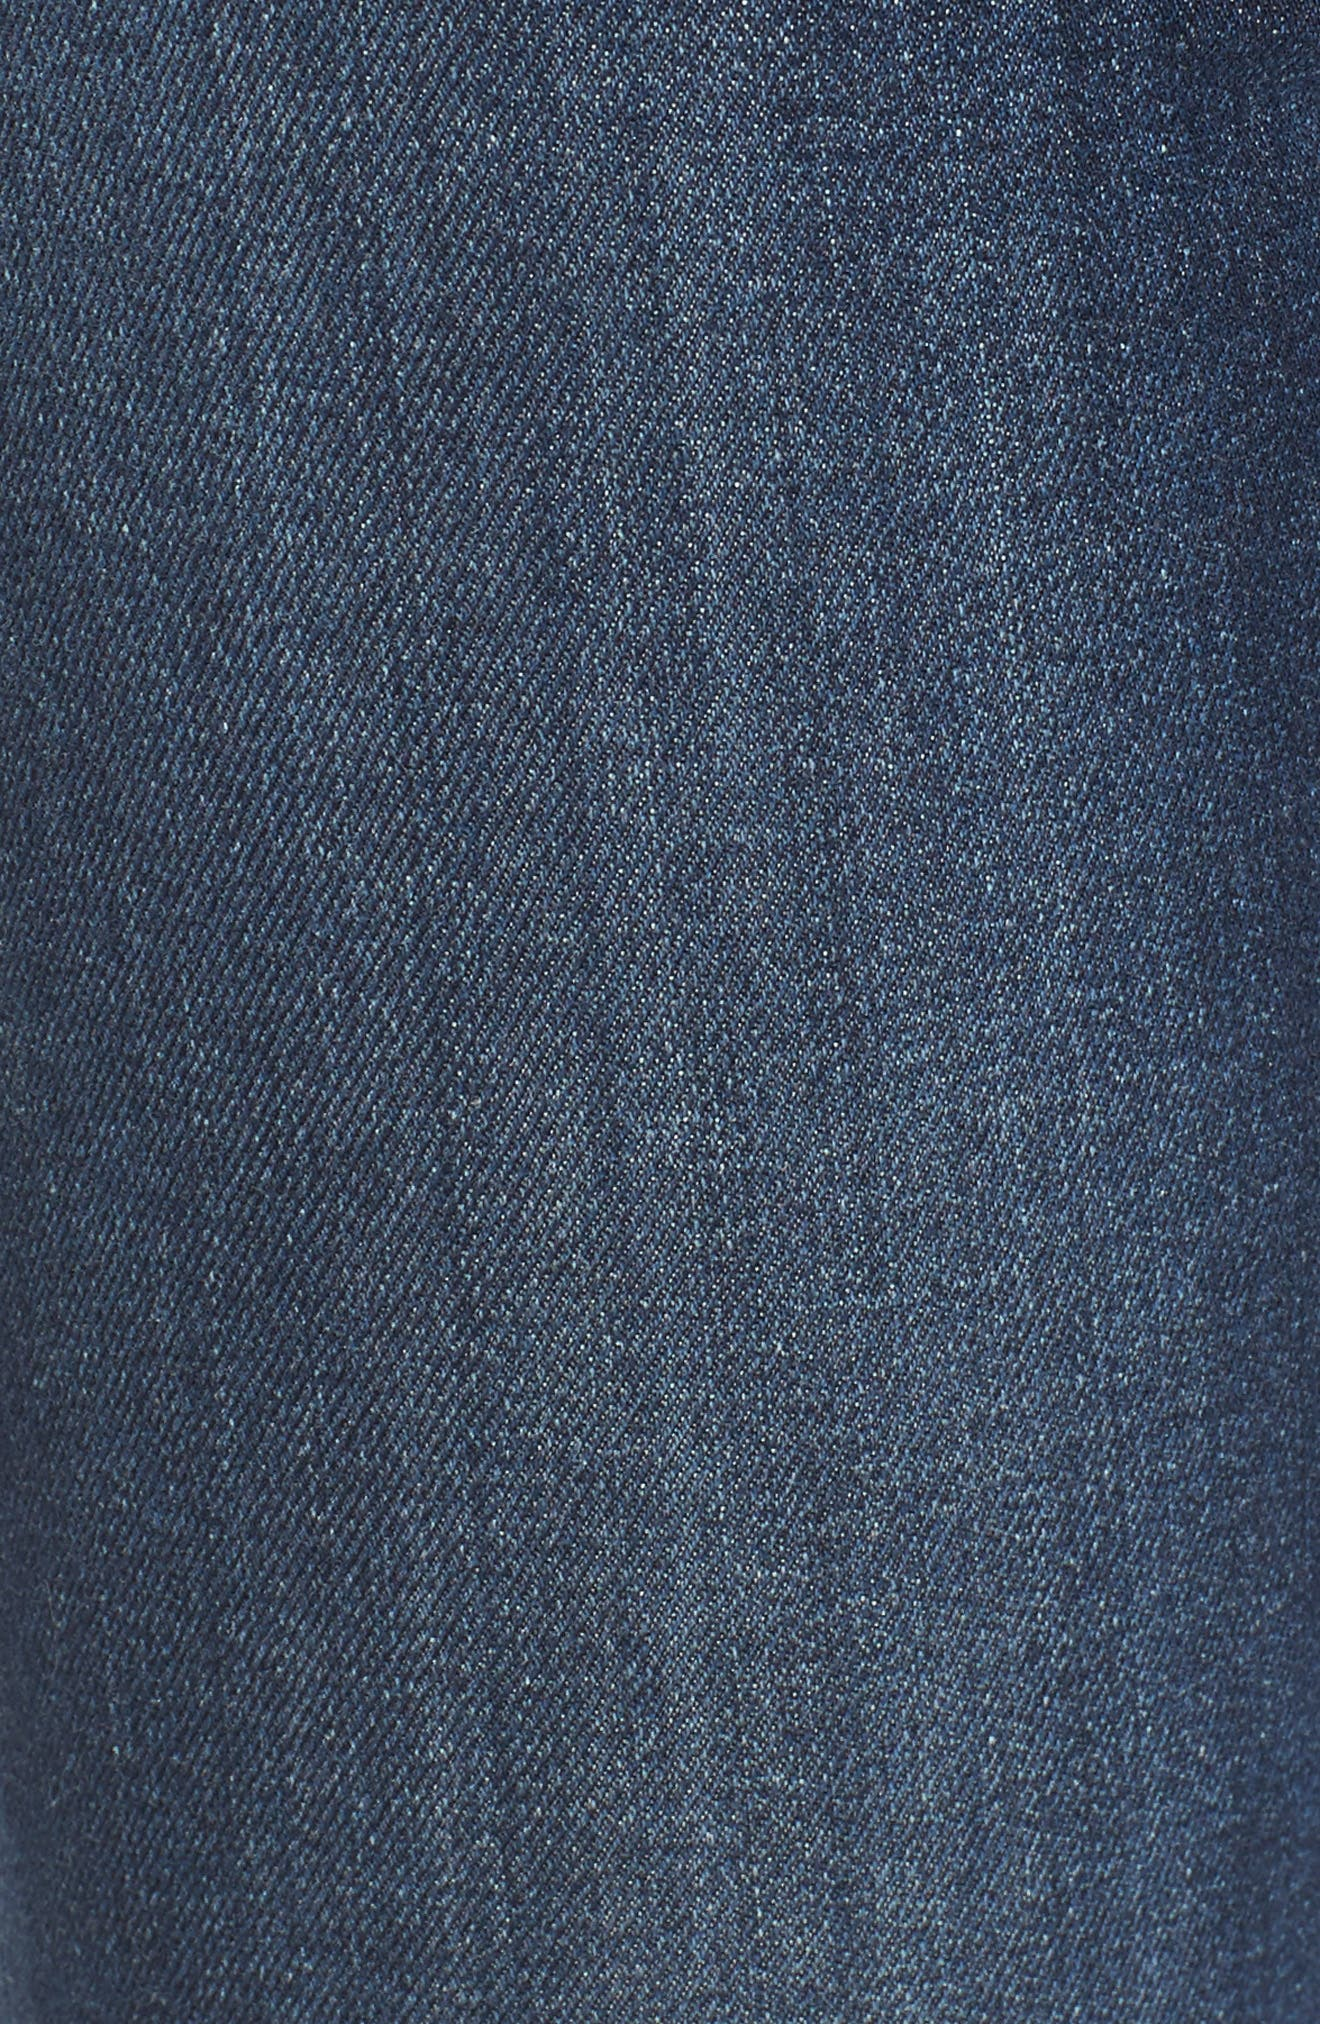 'Maria' Skinny Jeans,                             Alternate thumbnail 6, color,                             407